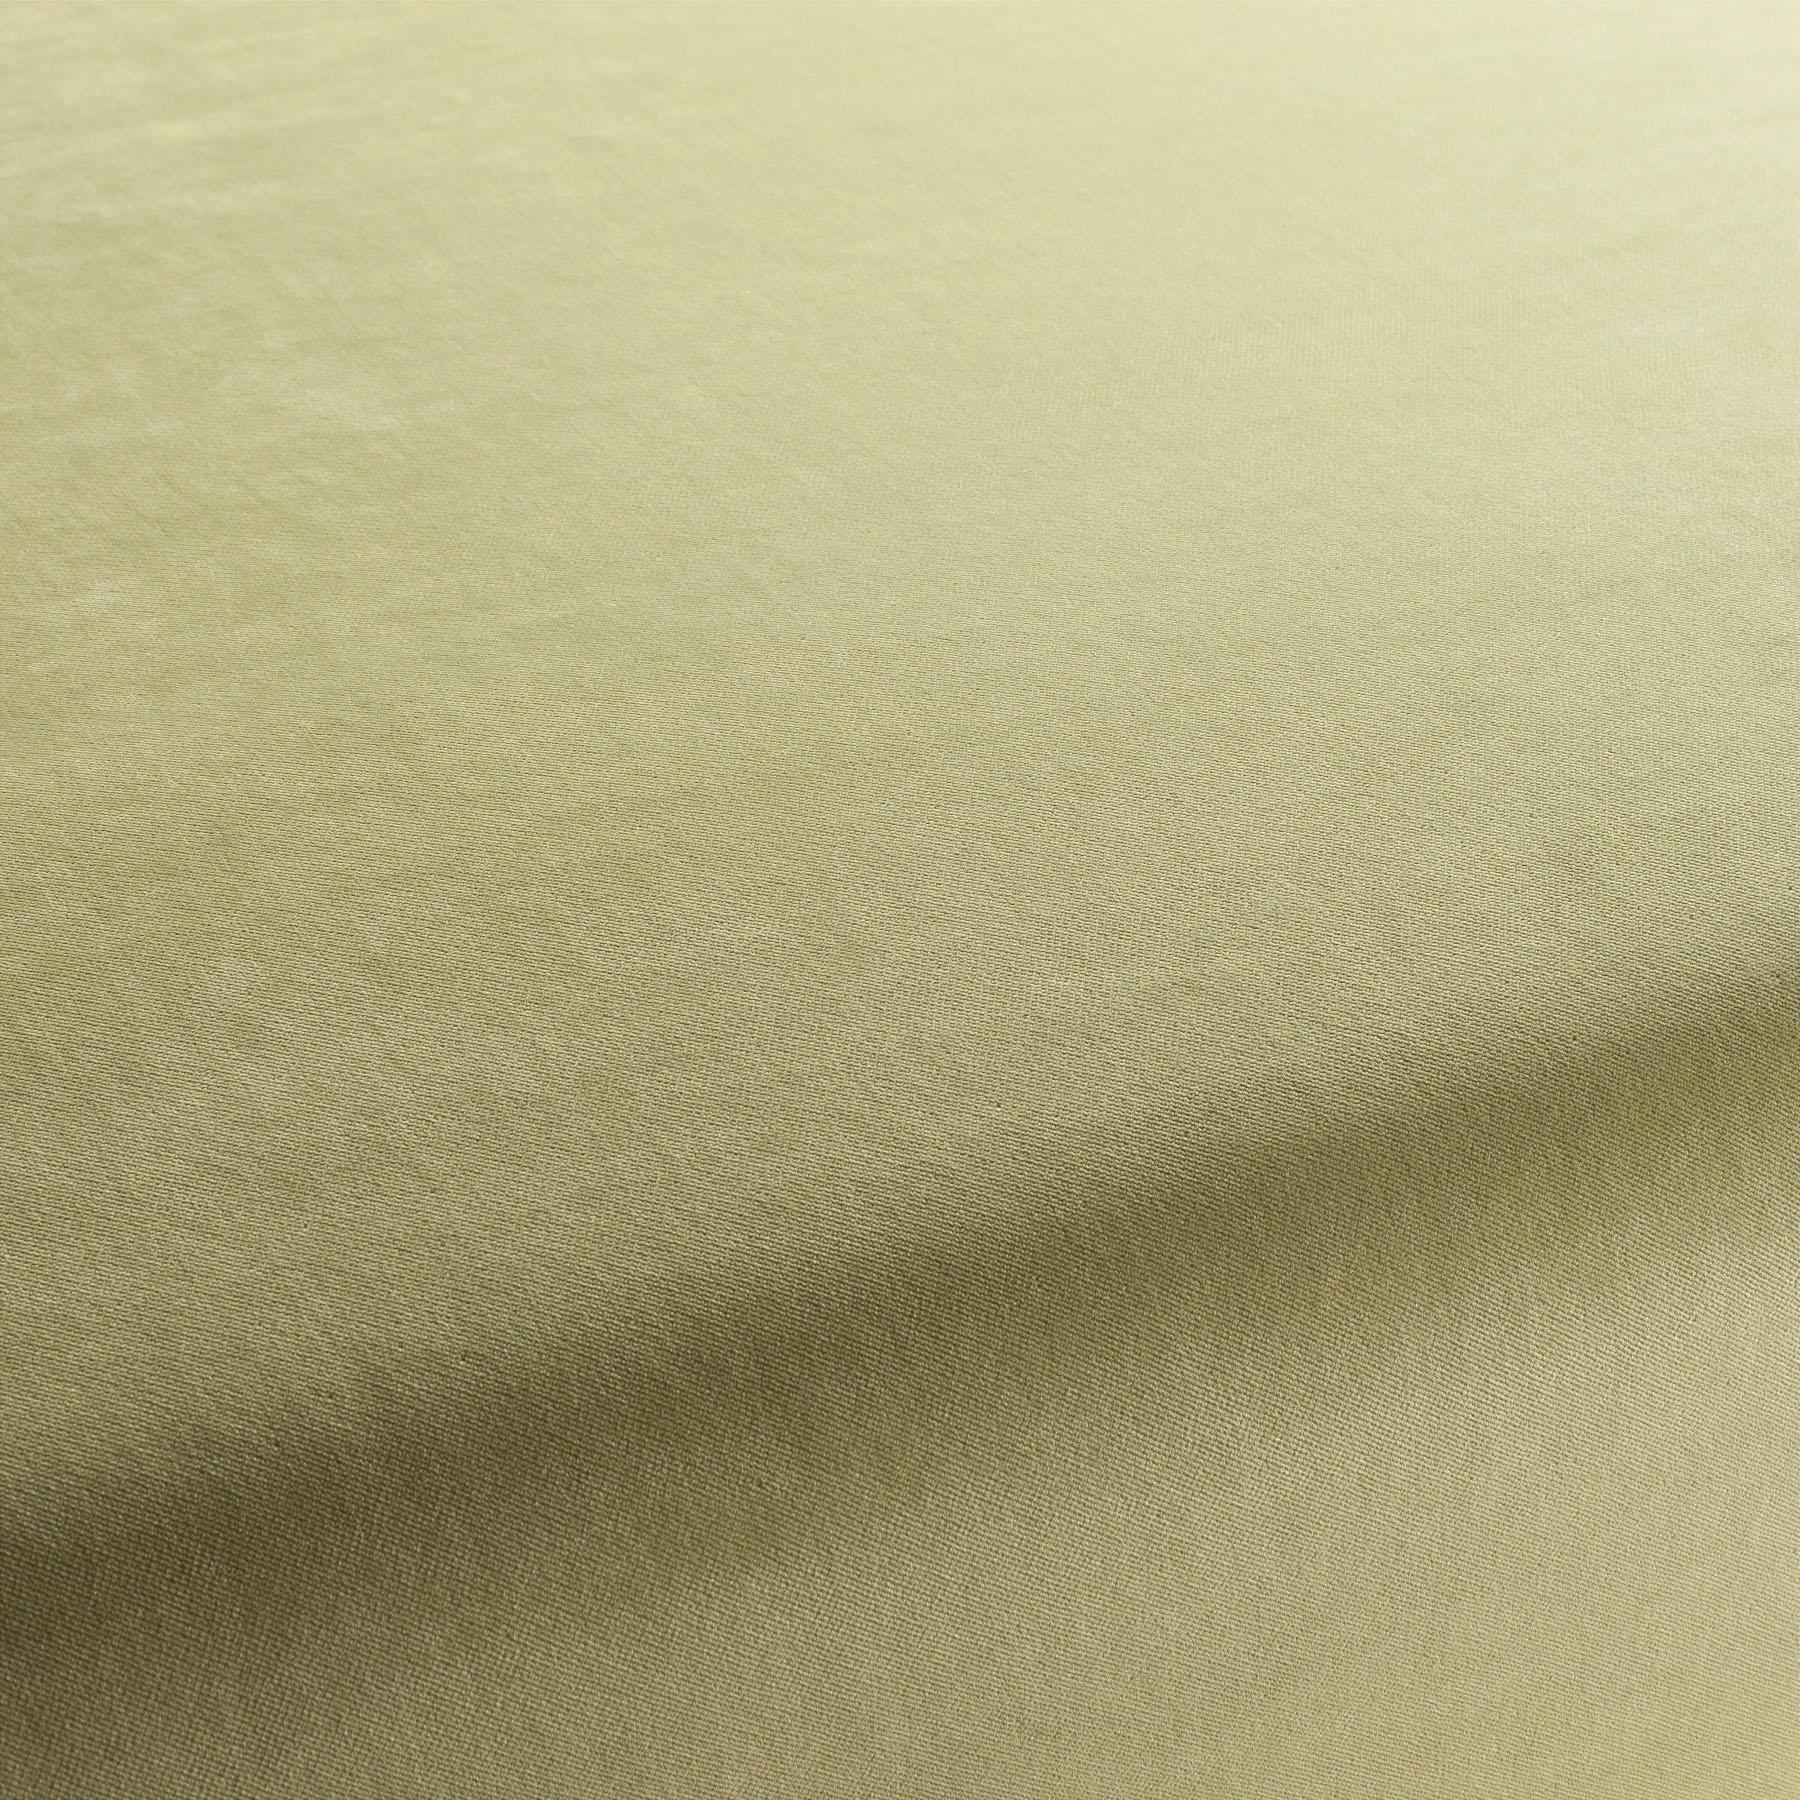 Upholstery Fabric Champion 1 3114 030 Jab Anstoetz Fabrics